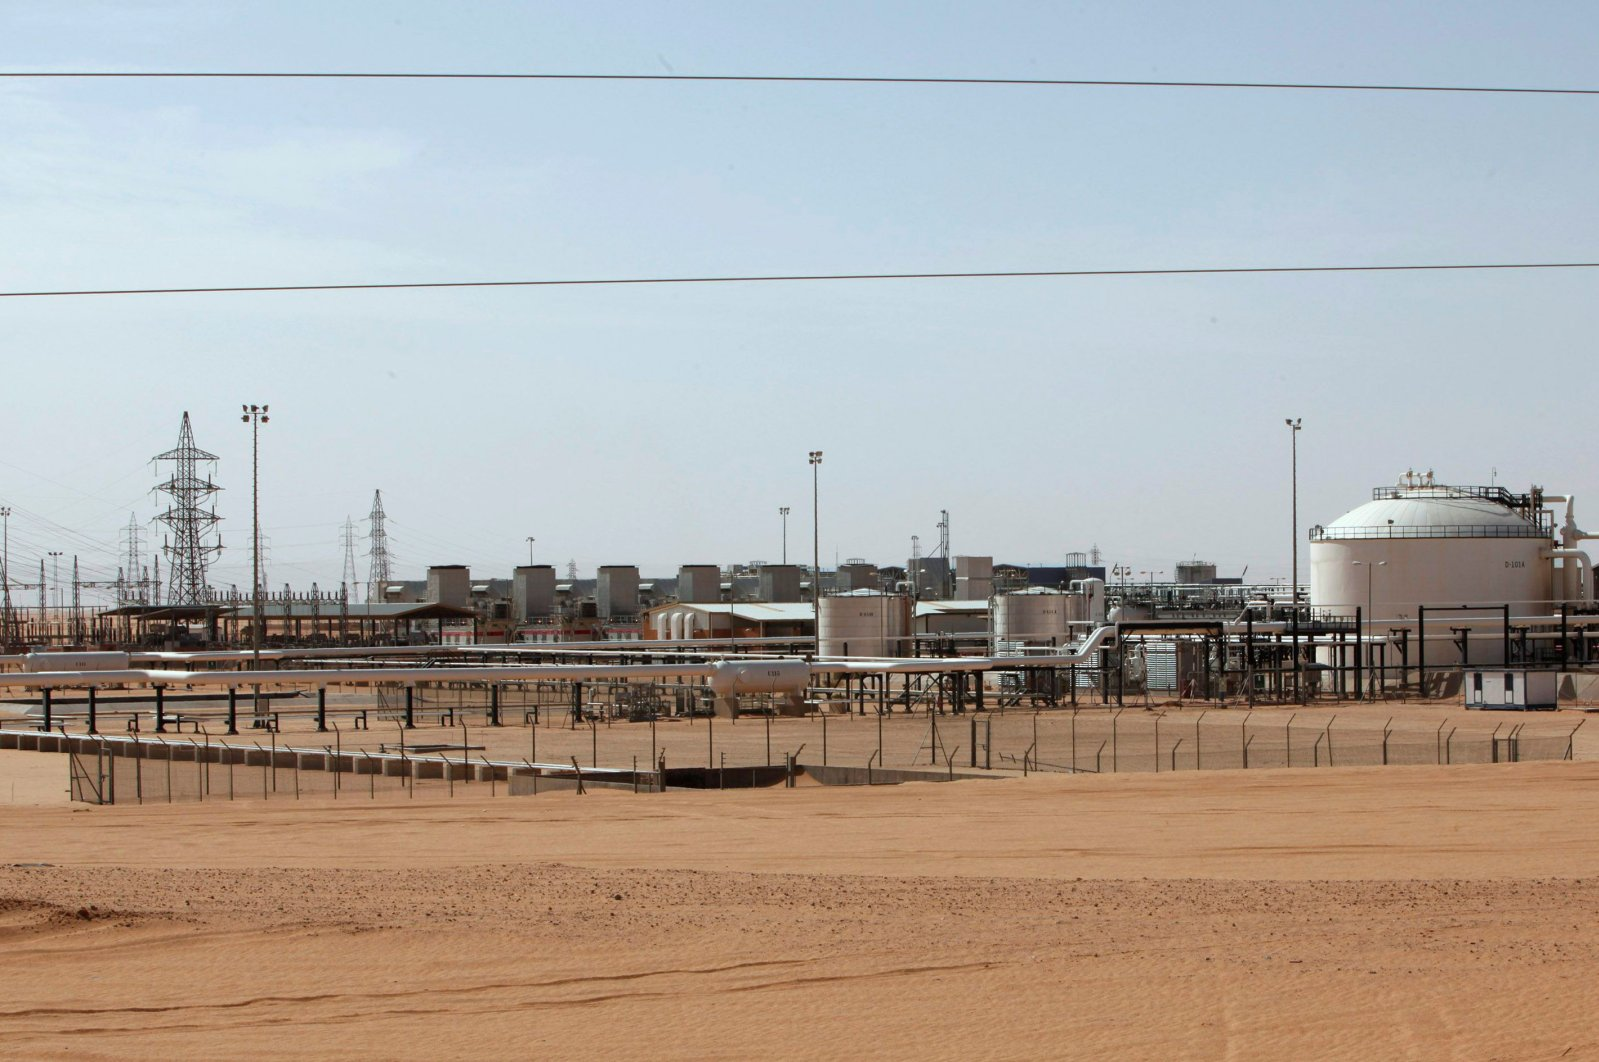 A general view of Libya's Sharara oil field, Dec. 3, 2014. (Reuters Photo)